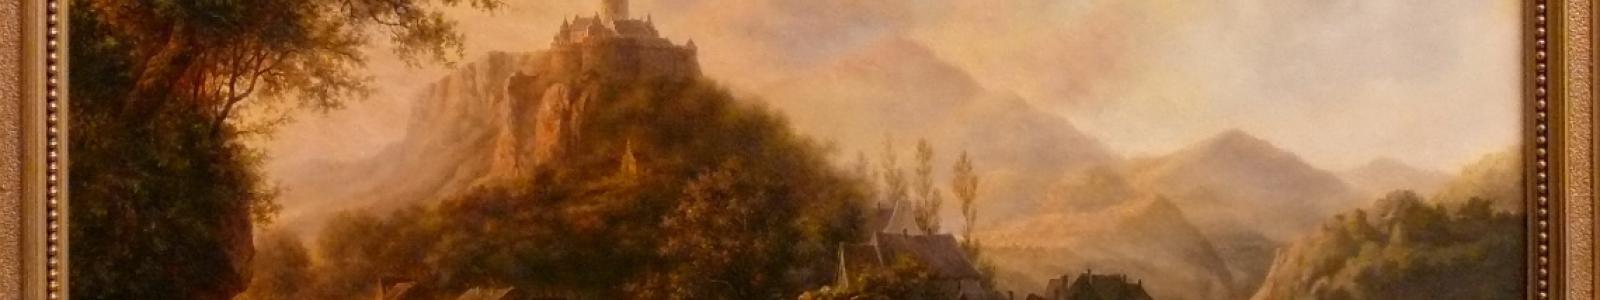 Gallery Painter SERGEI IAKUSHCHENKO